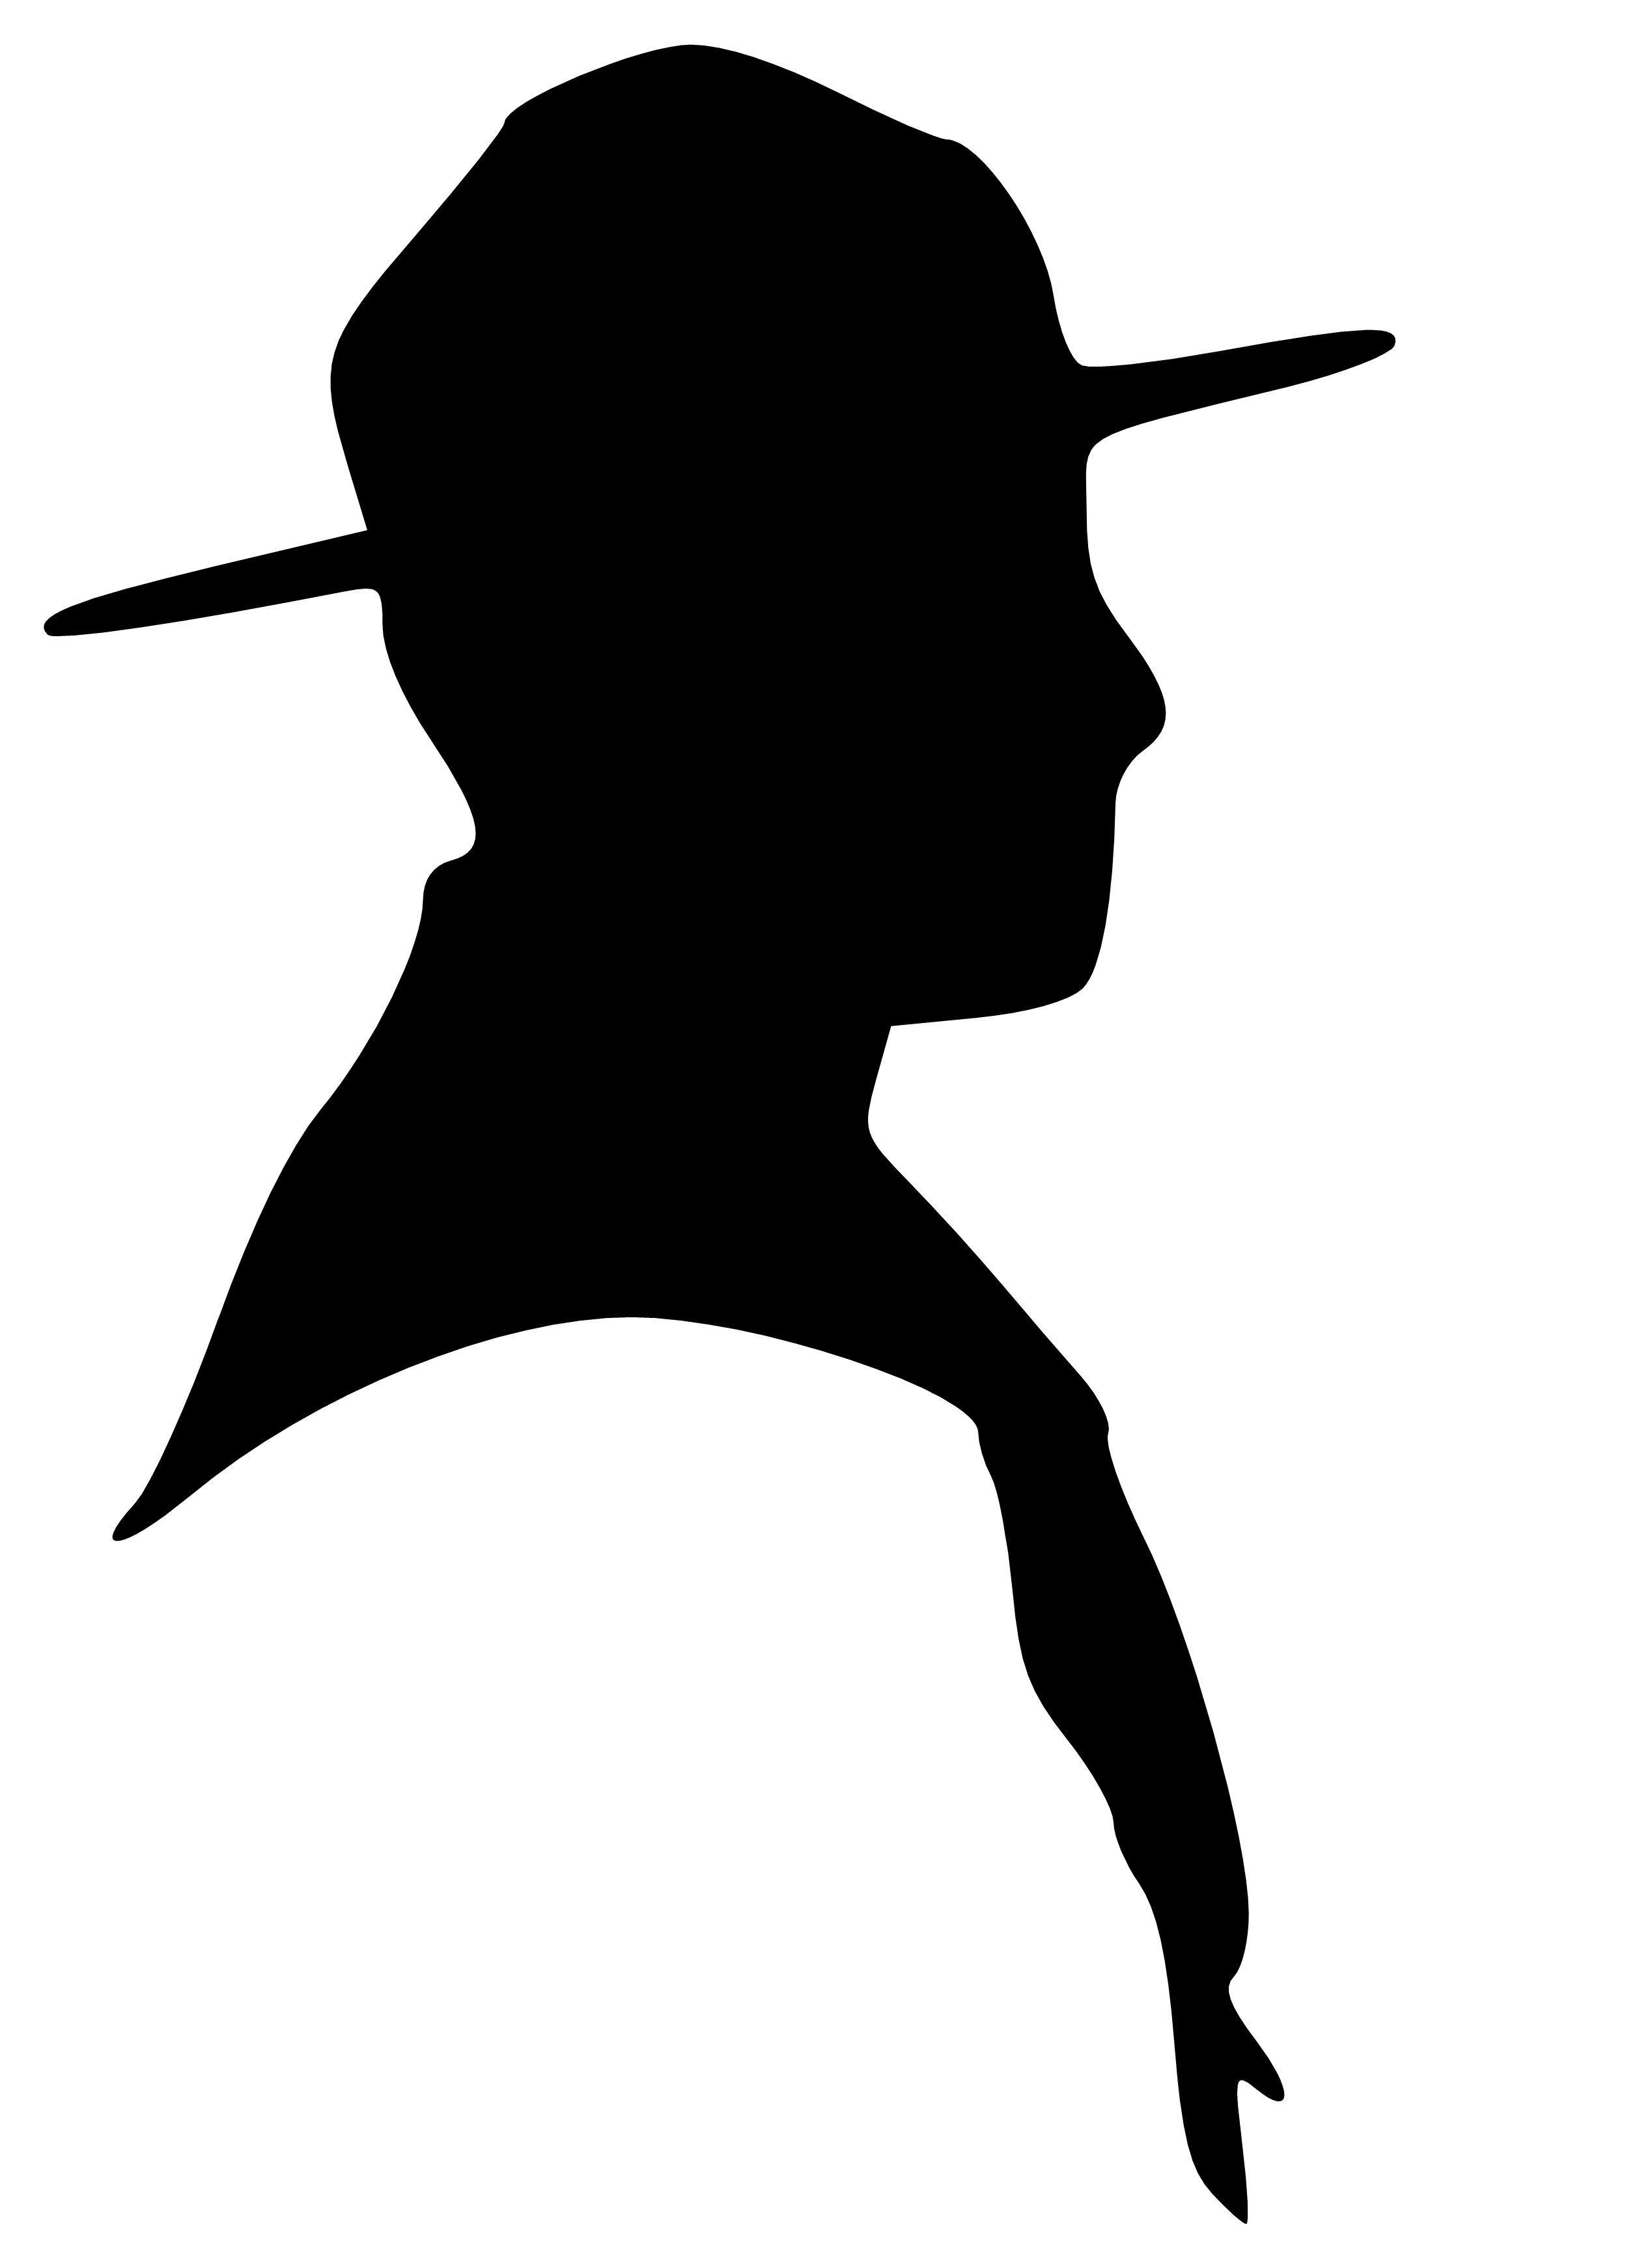 boy scout svg - Stencils For Boys